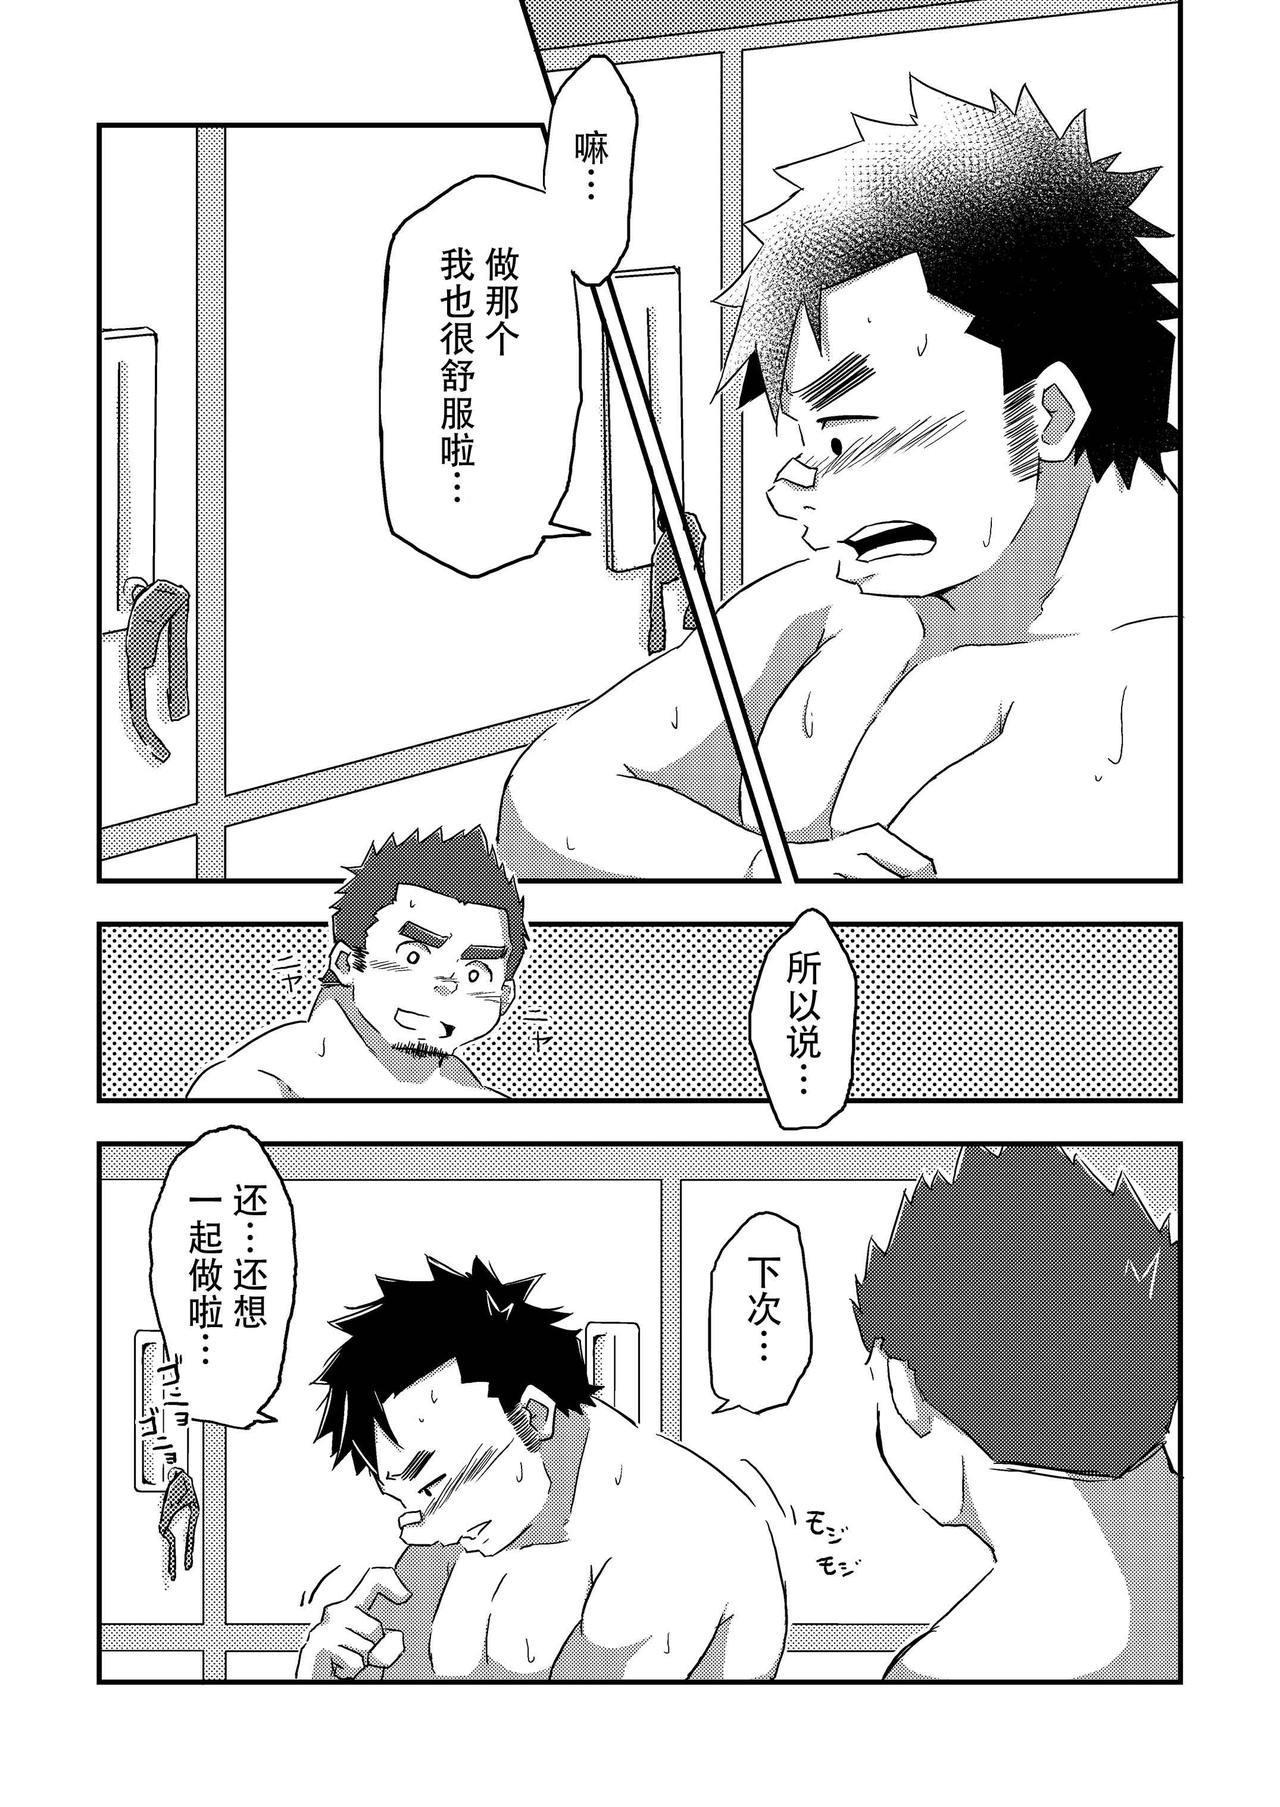 [CorkBOX (ngng)] Ise-kun wa Tamatte Iru. - Ise-kun is horny. [Chinese] {日曜日汉化} [Digital] 27